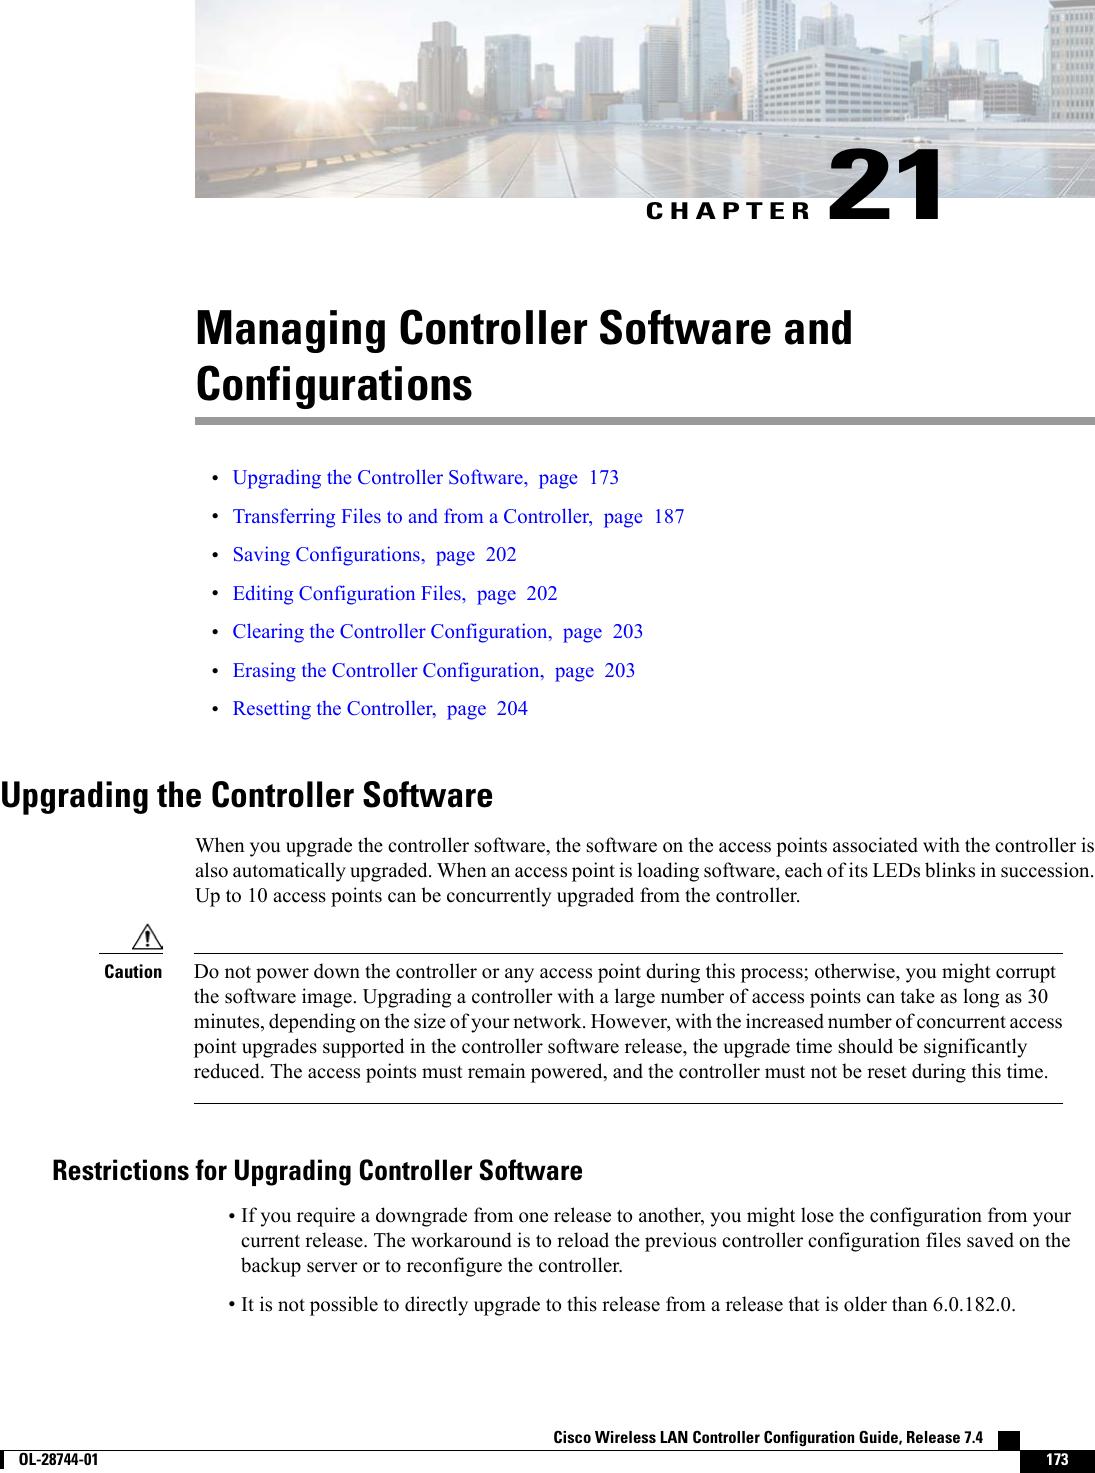 Cisco Wlc Copy Primary Image To Backup